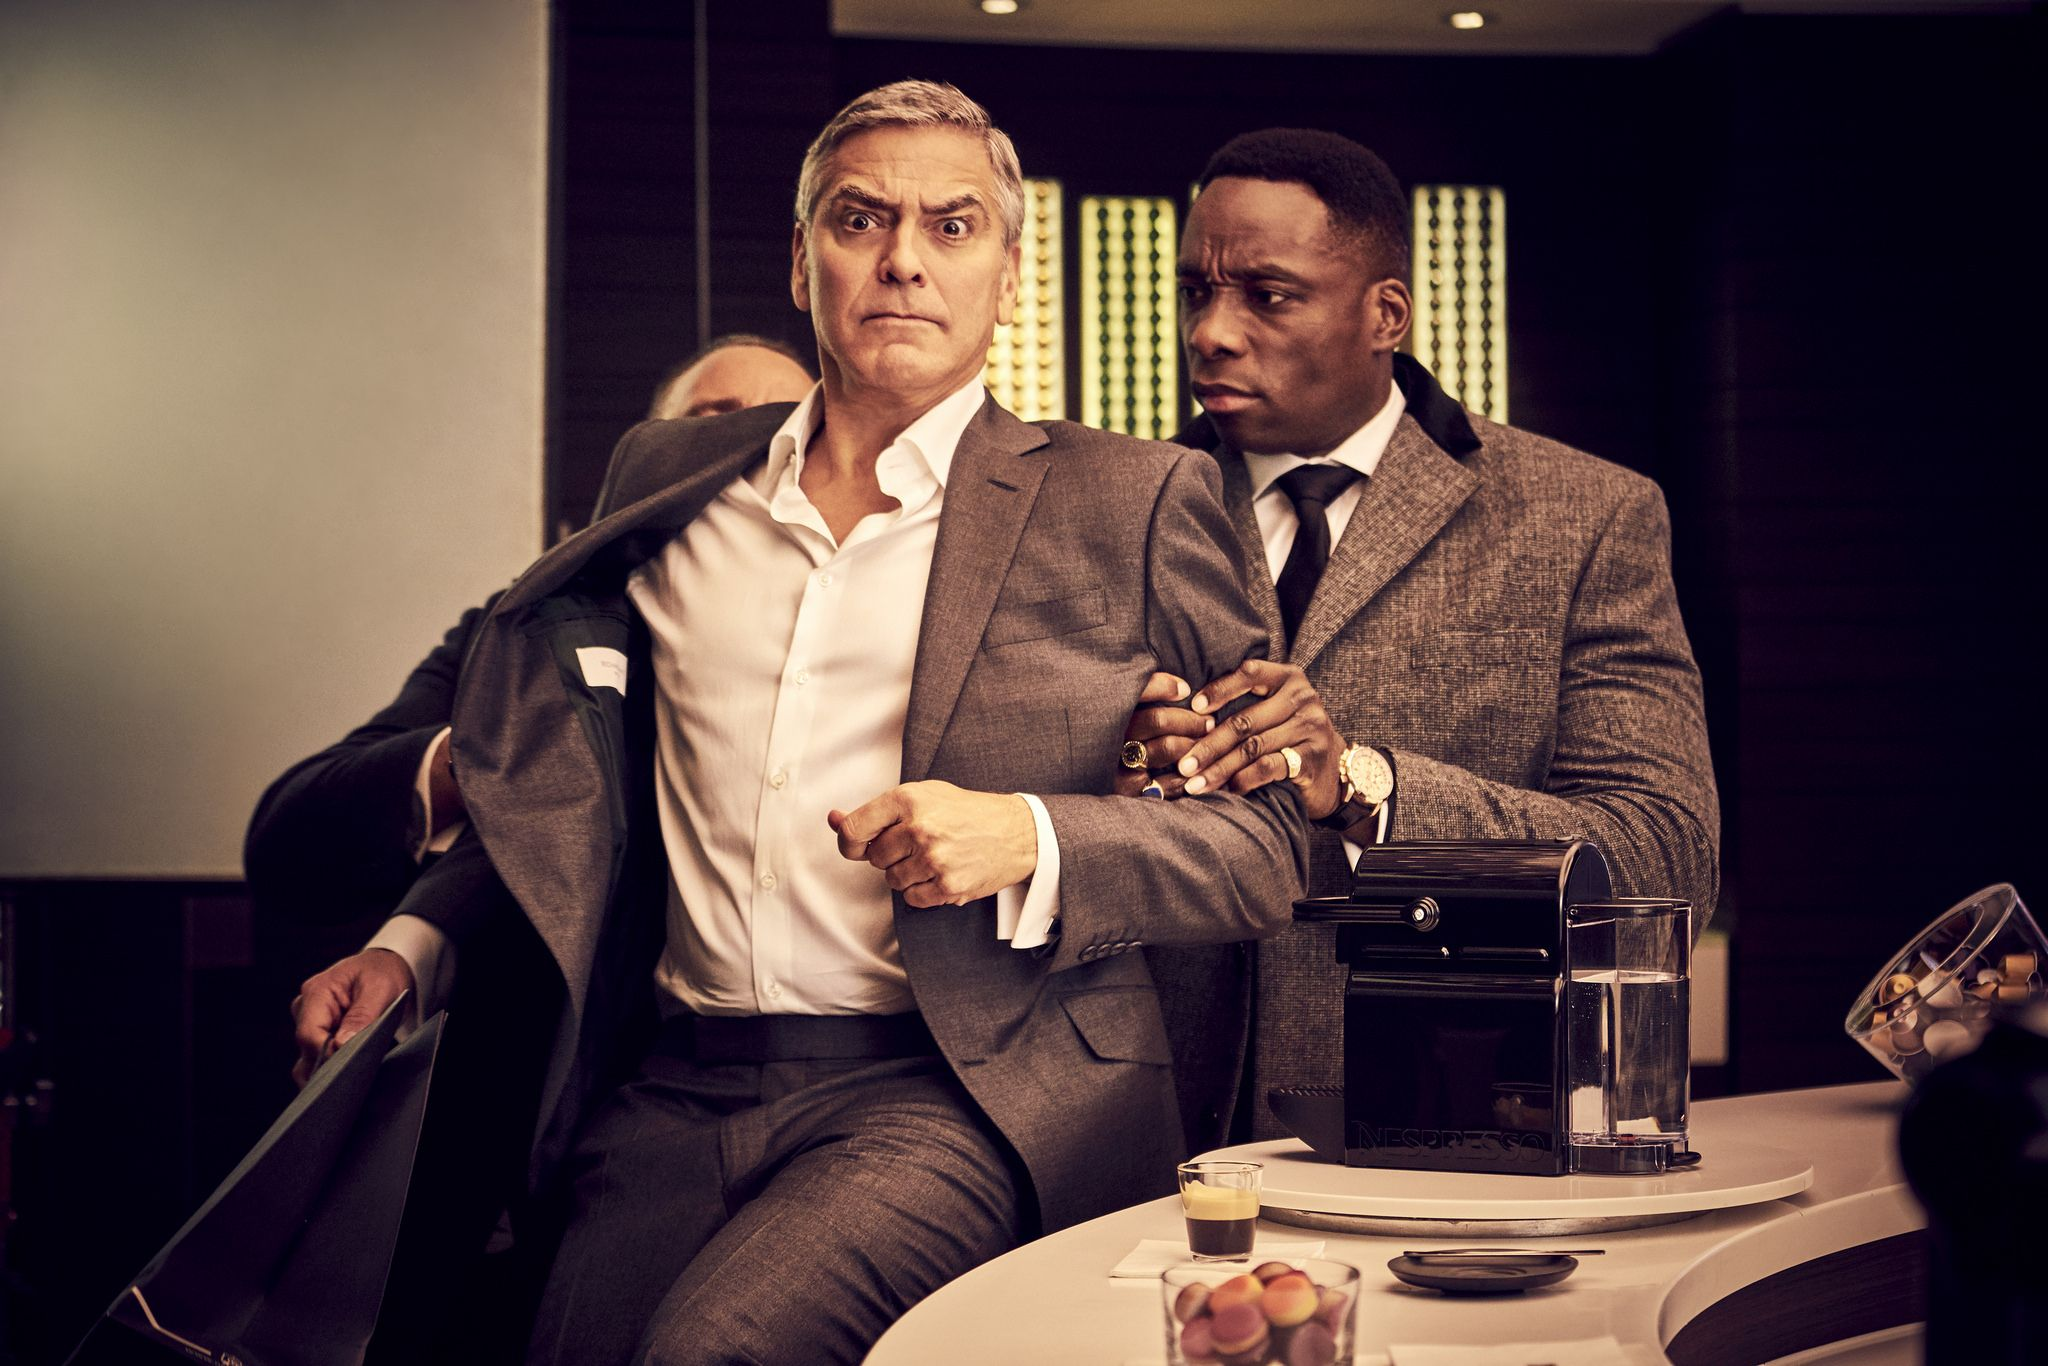 George Clooney a Nespresso új reklámfilmjében - Change Nothing